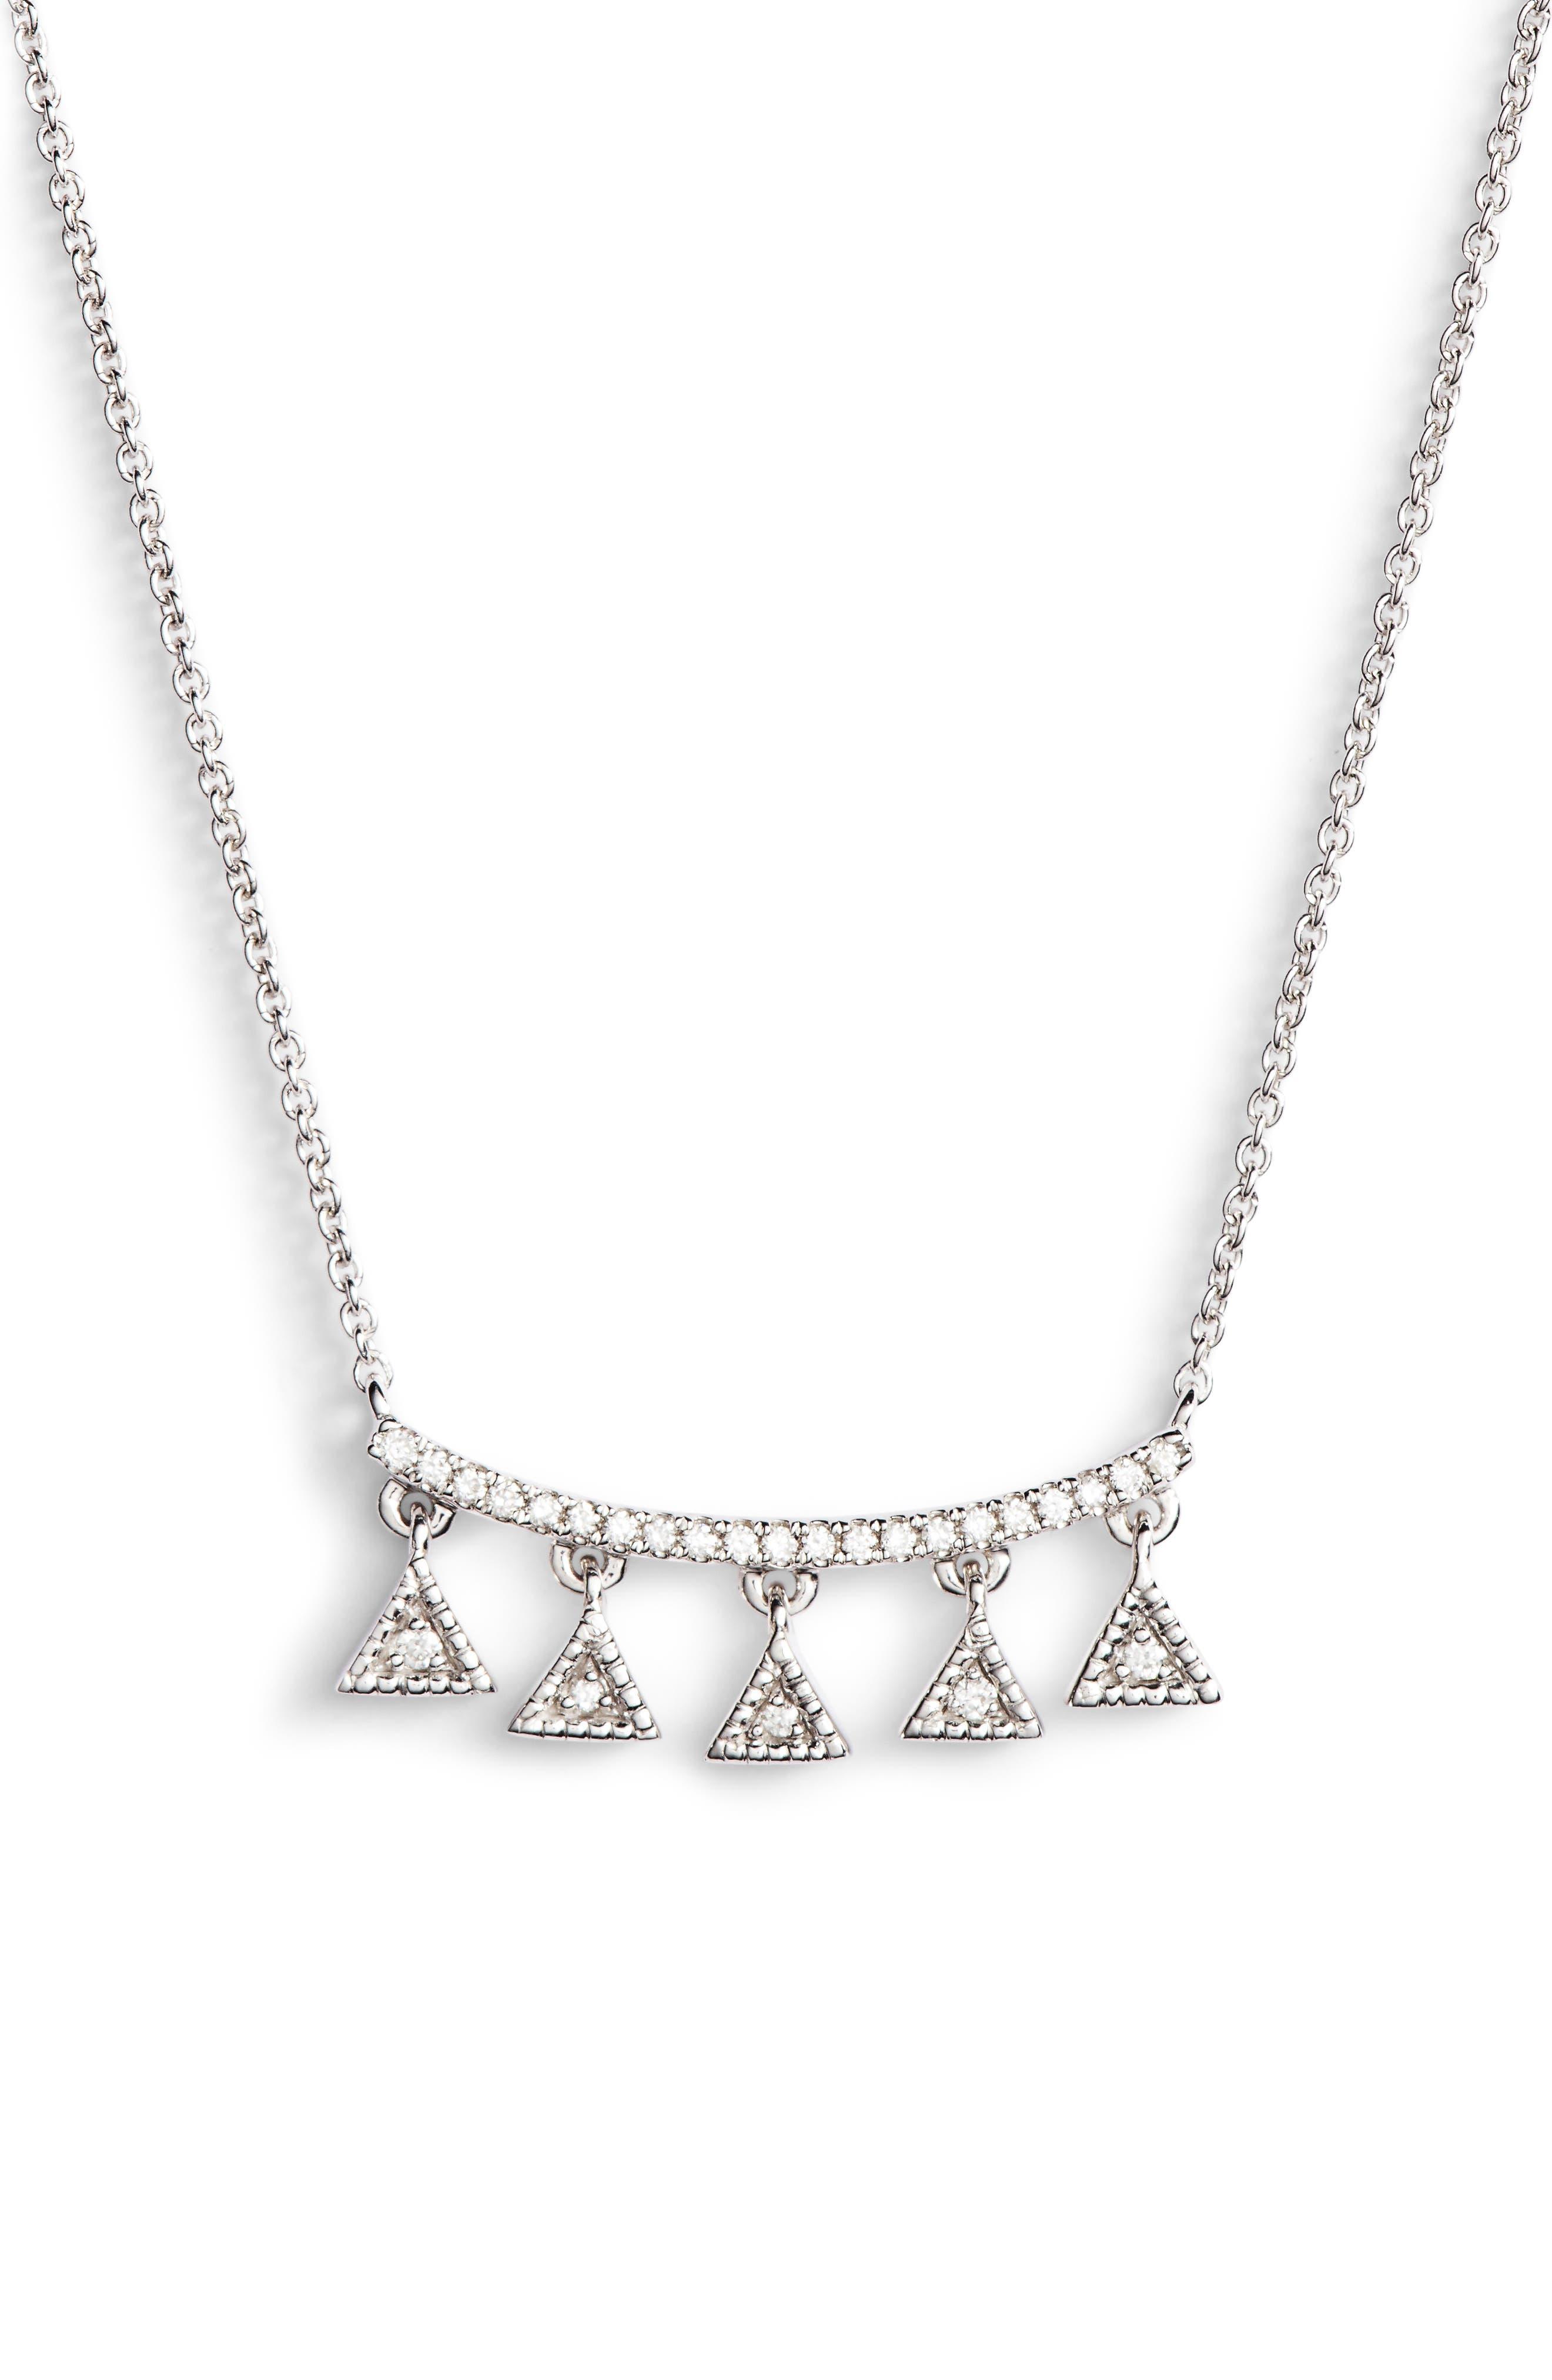 Main Image - Dana Rebecca Designs Emily Sarah Diamond Pendant Necklace